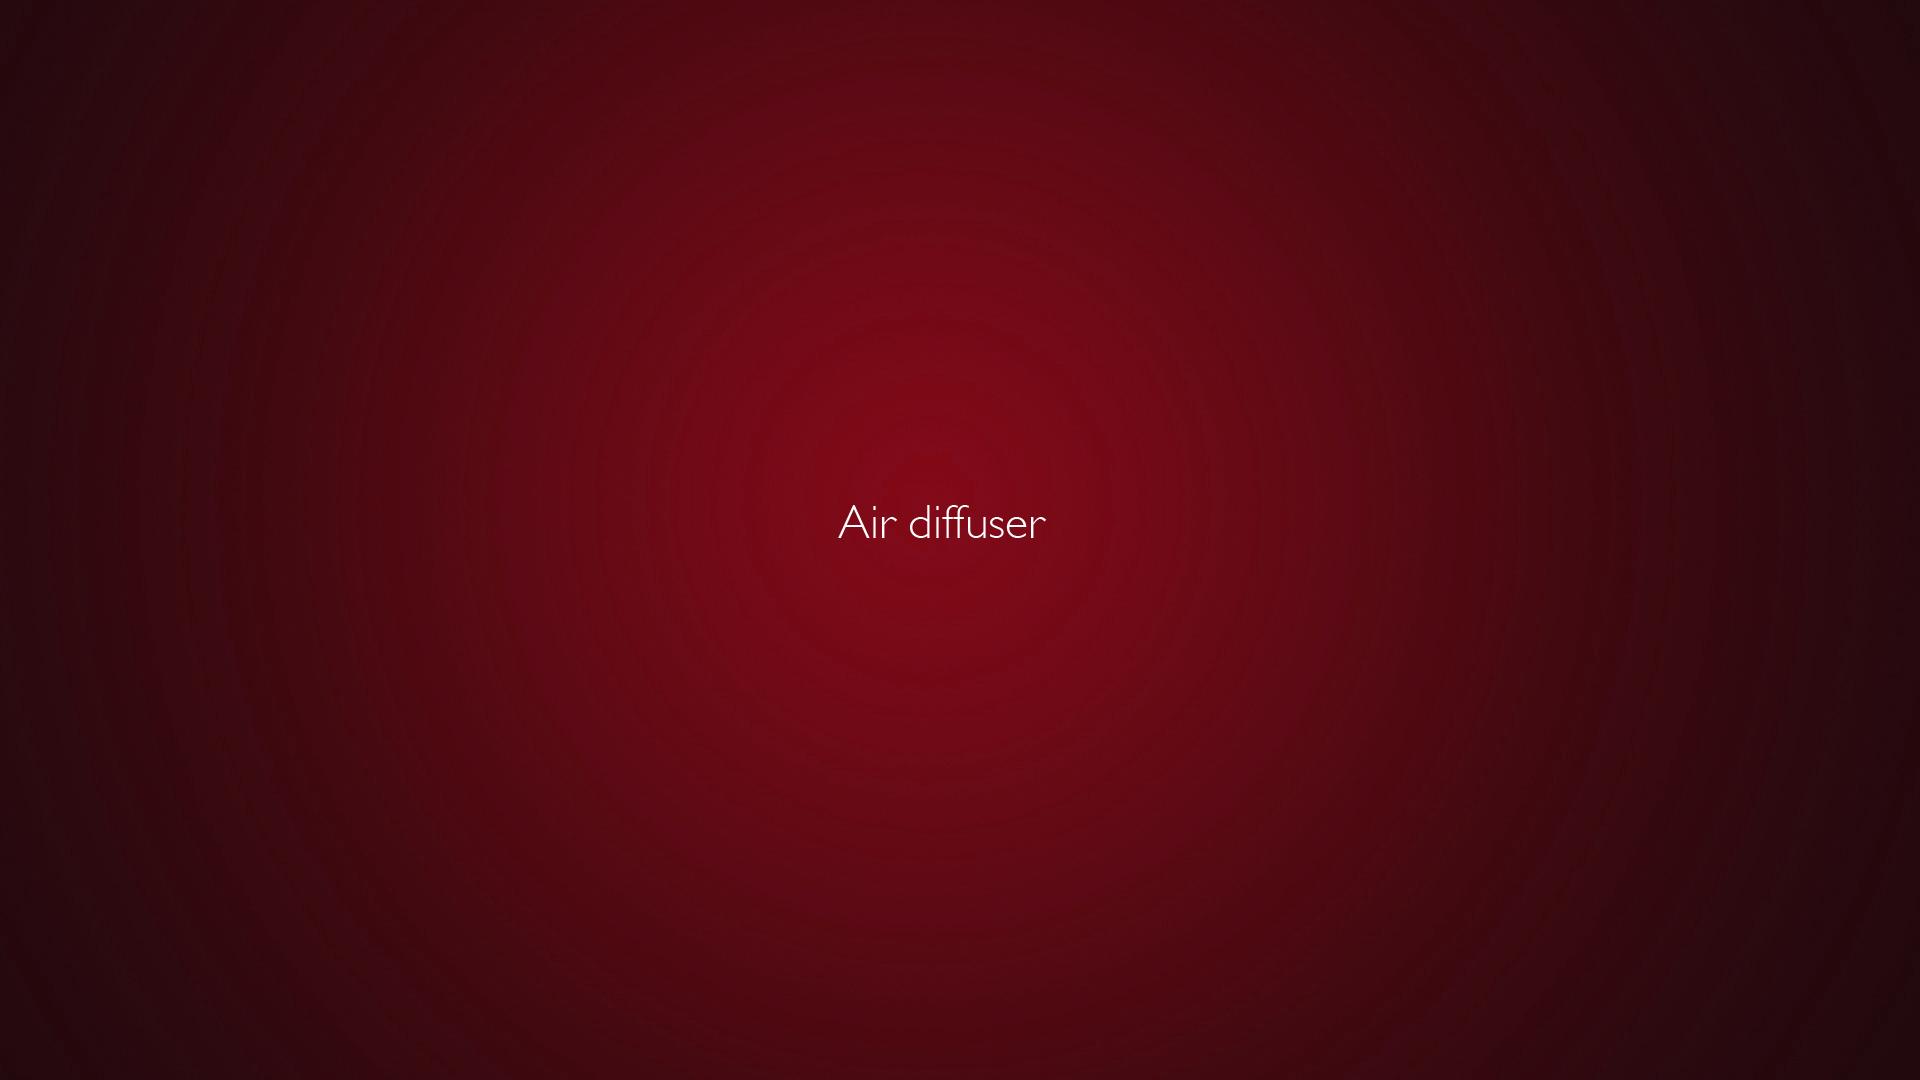 tt air diffuser